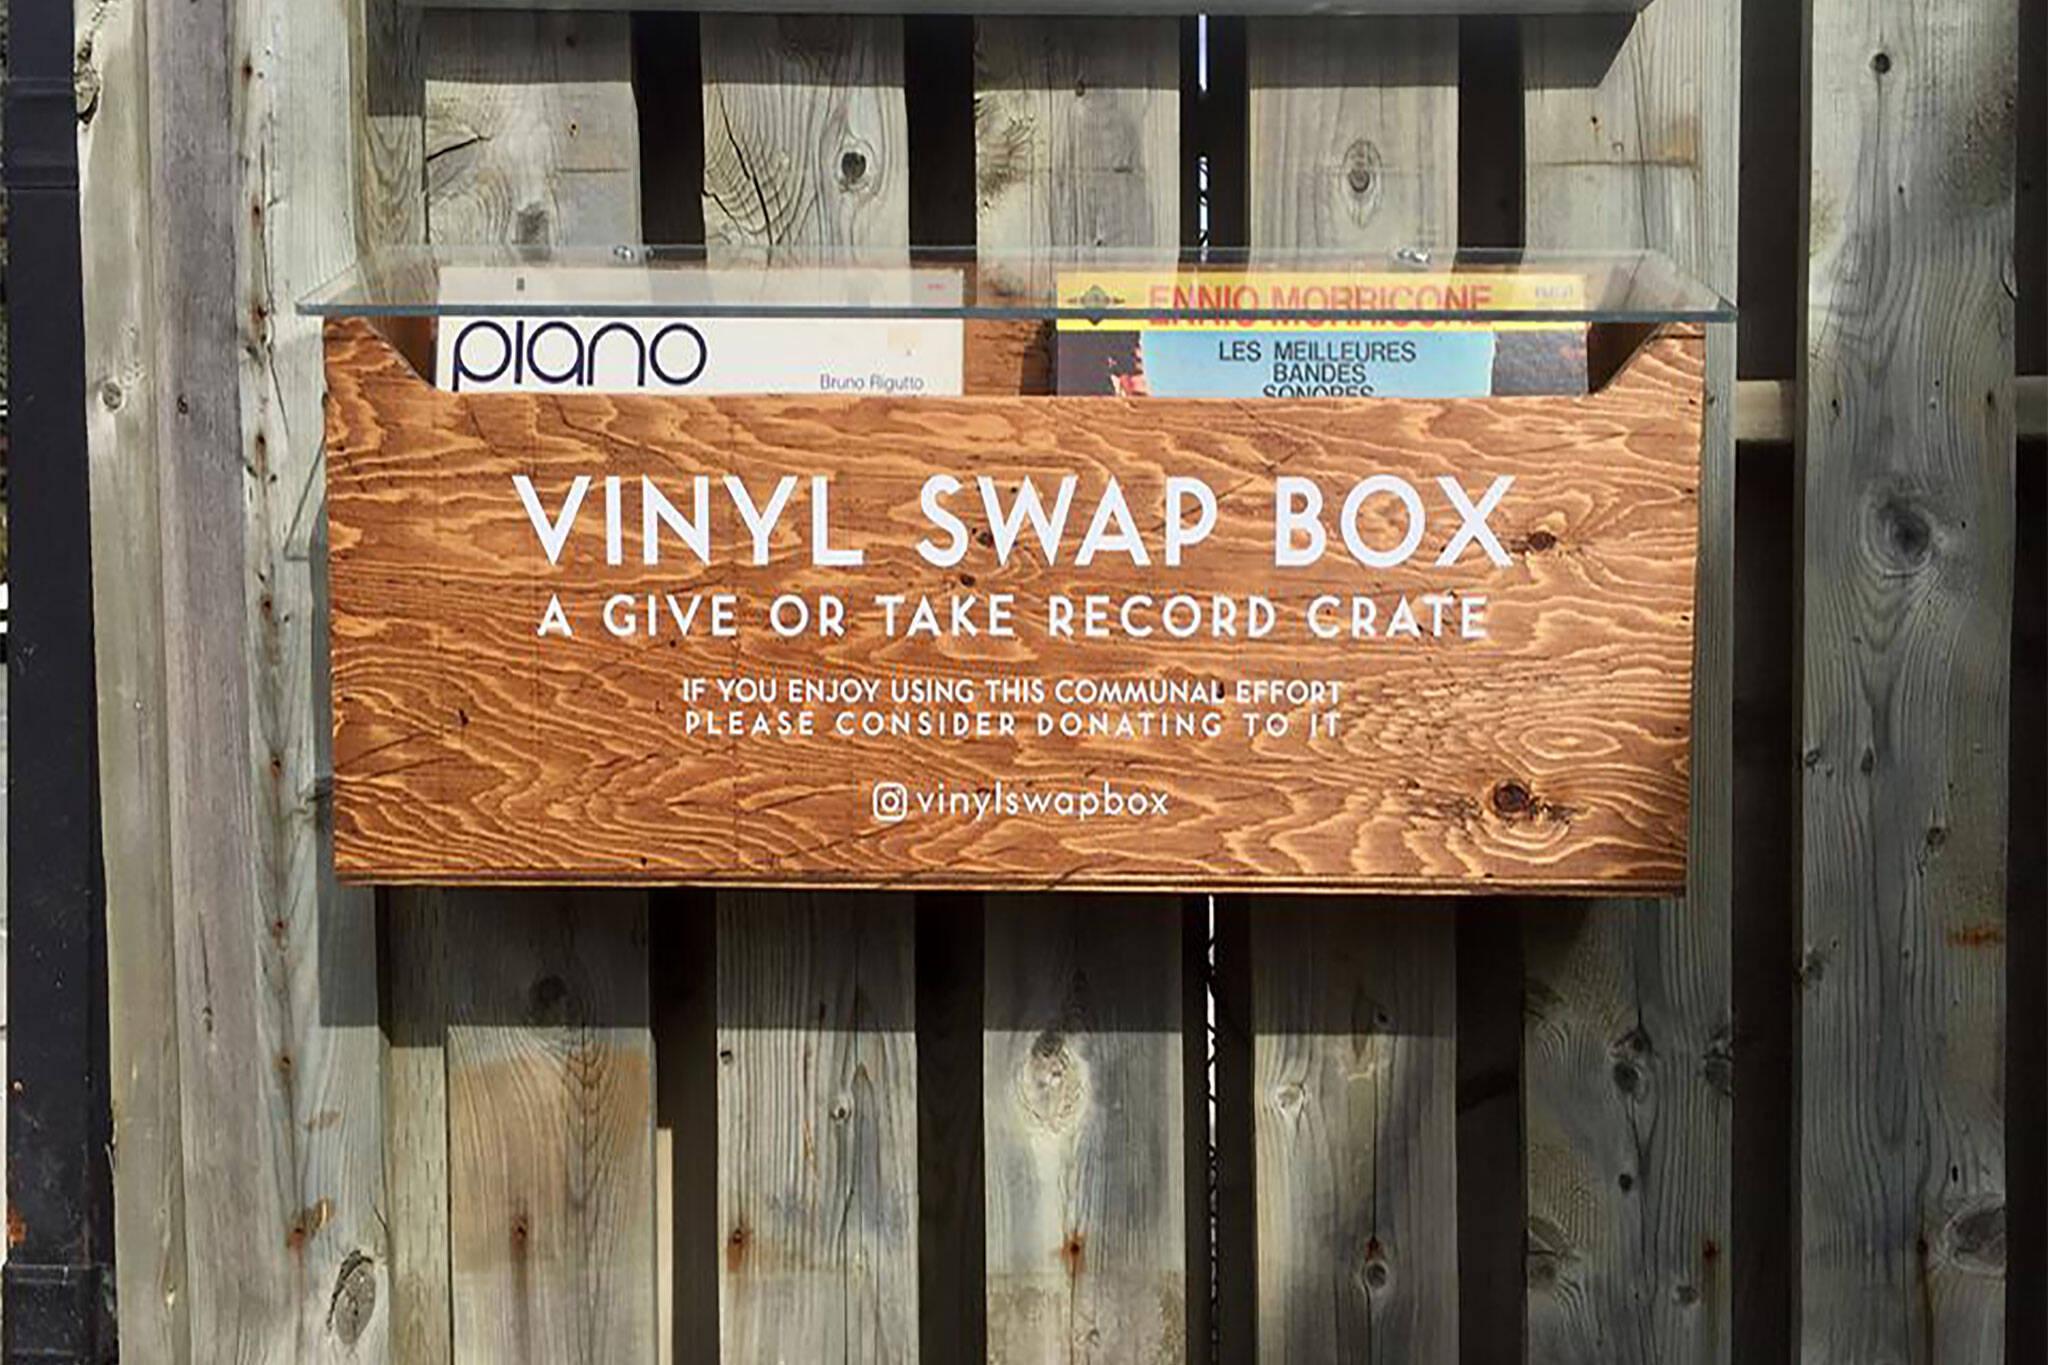 vinyl swap box